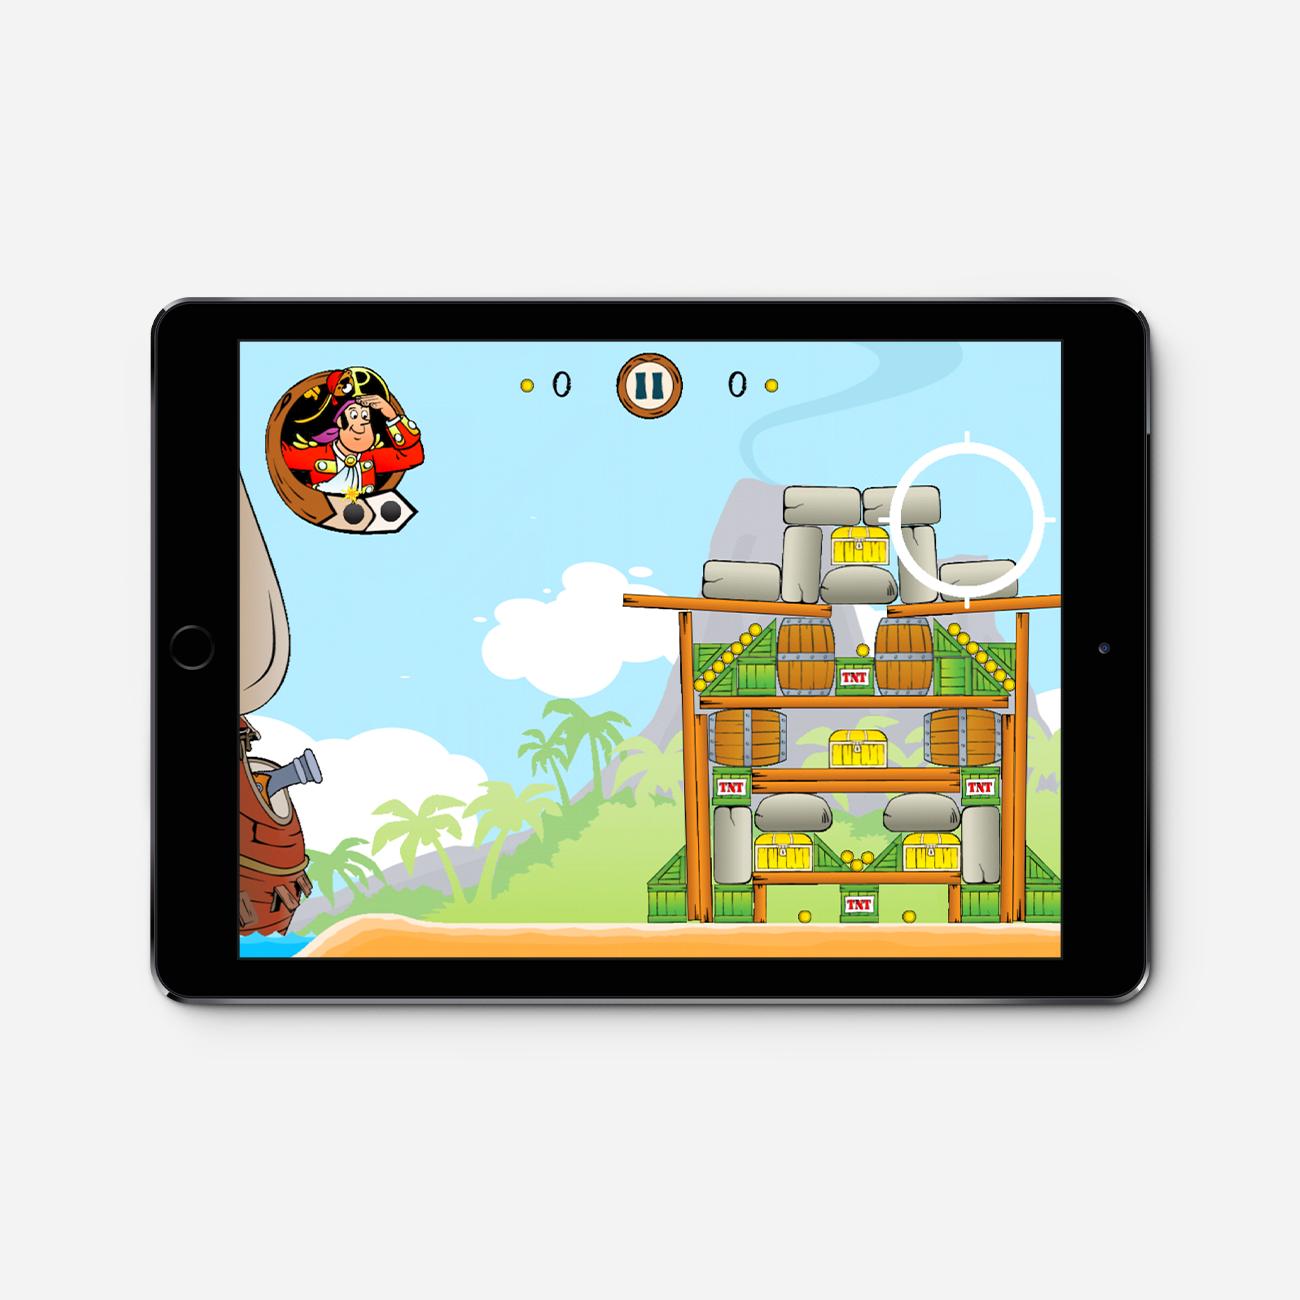 Piet Piraat Schattenjacht IOS Game Detail